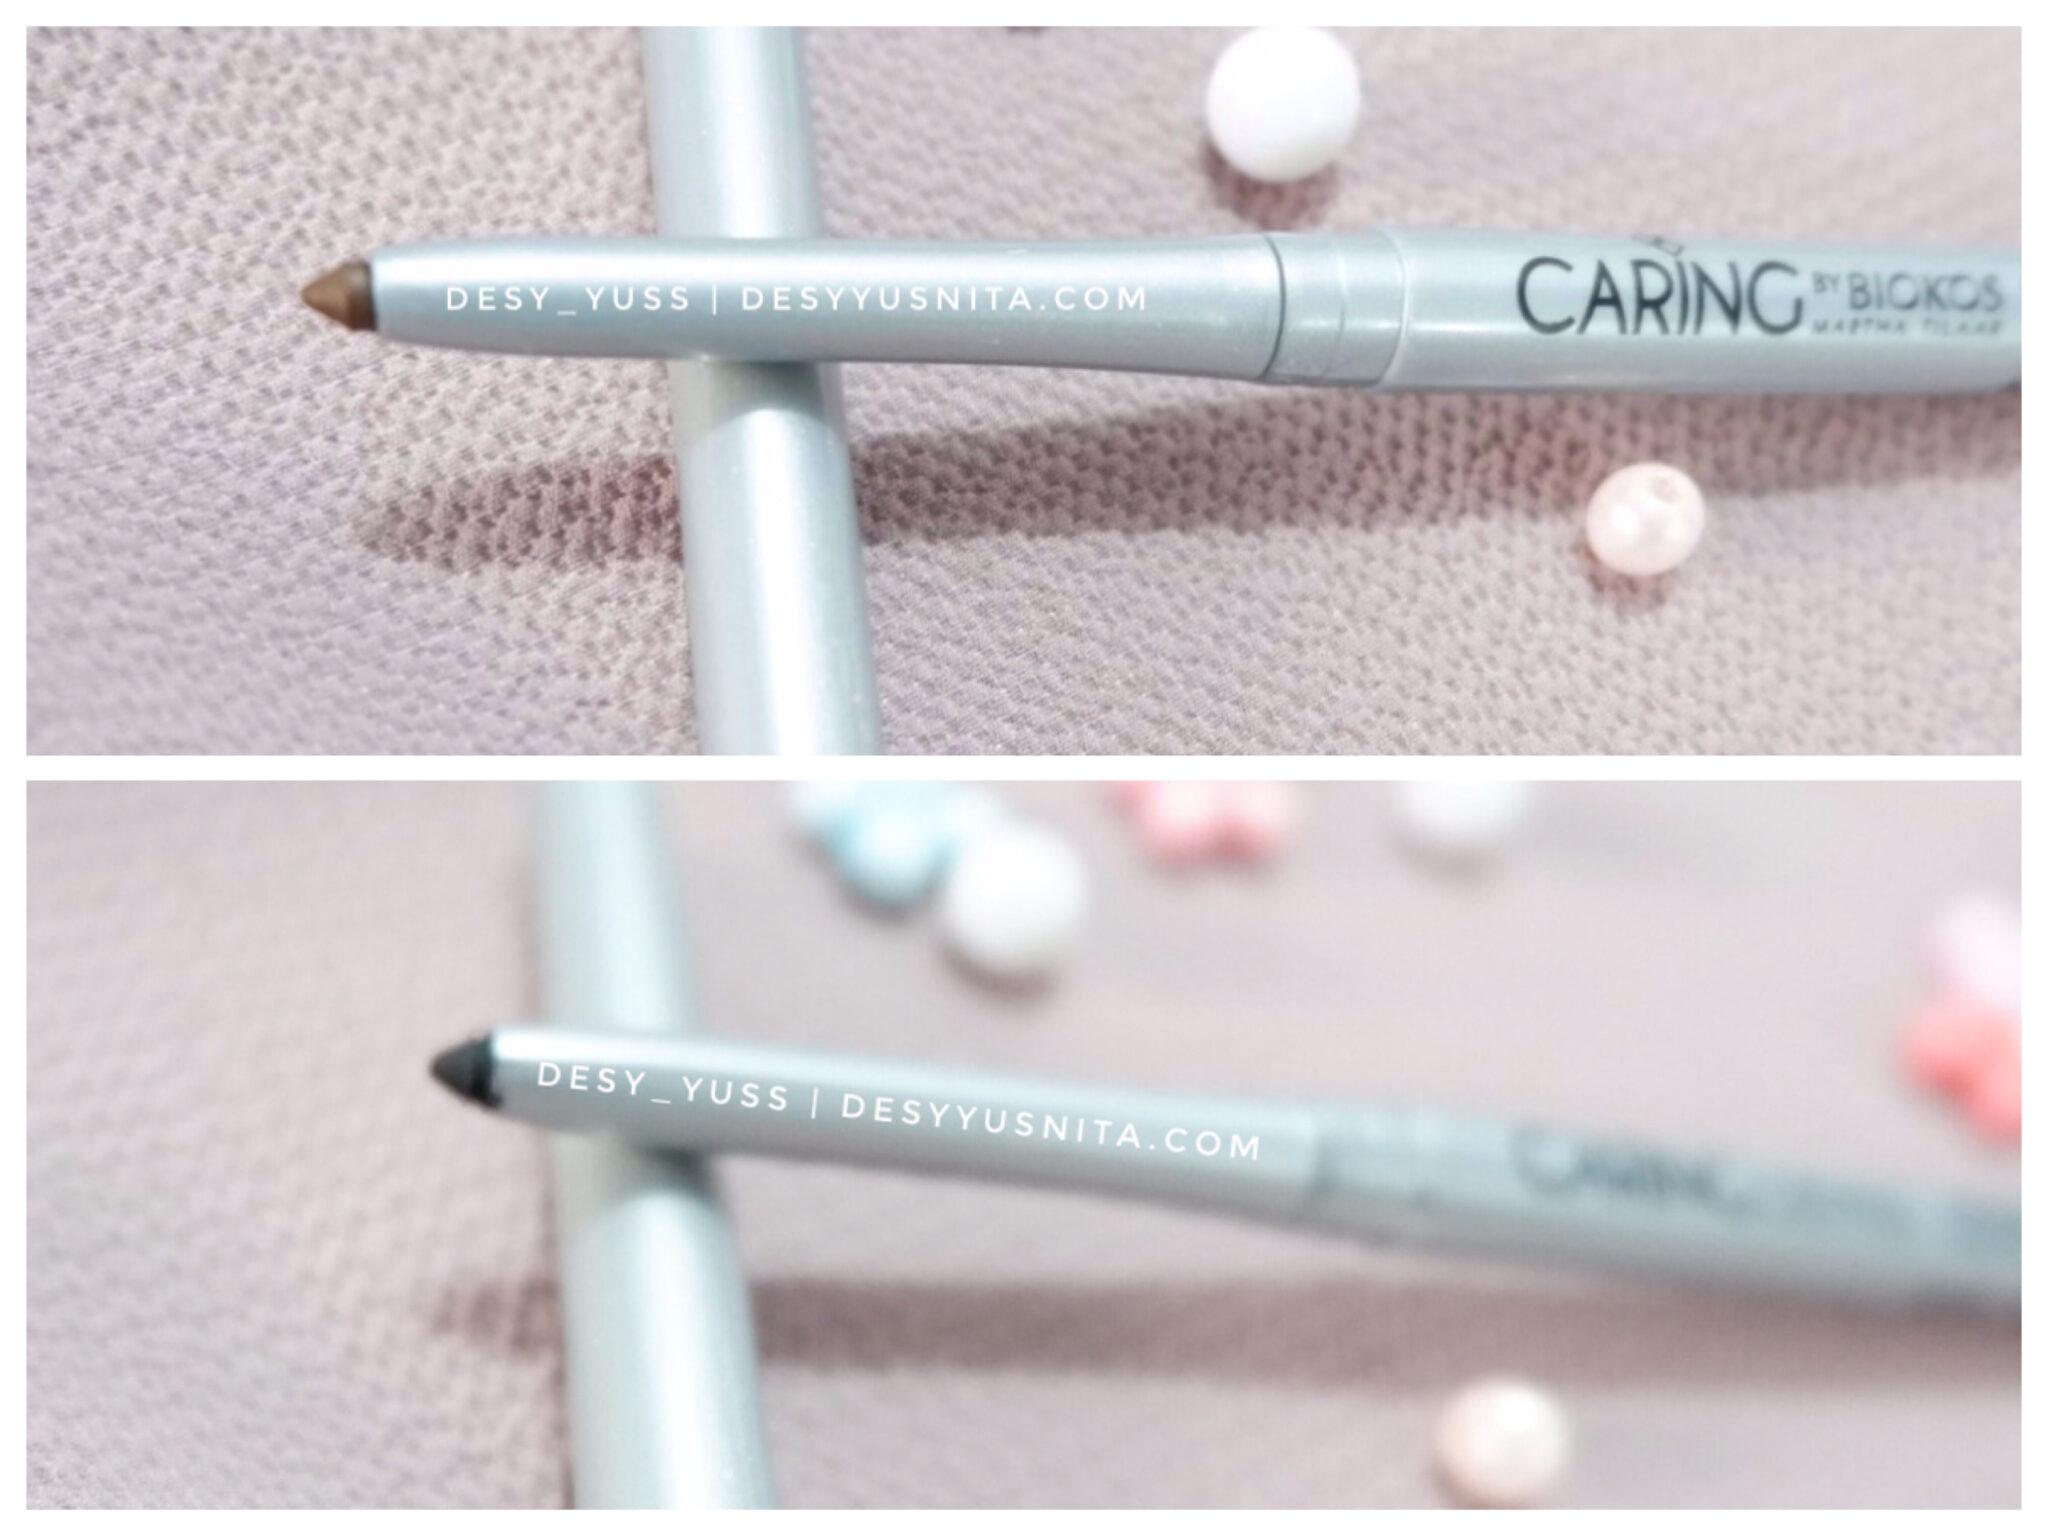 Automatic Eyeliner Caring by Biokos, skin care make up, kosmetik, make up, treatment, eyeliner, mata, Caring, Biokos